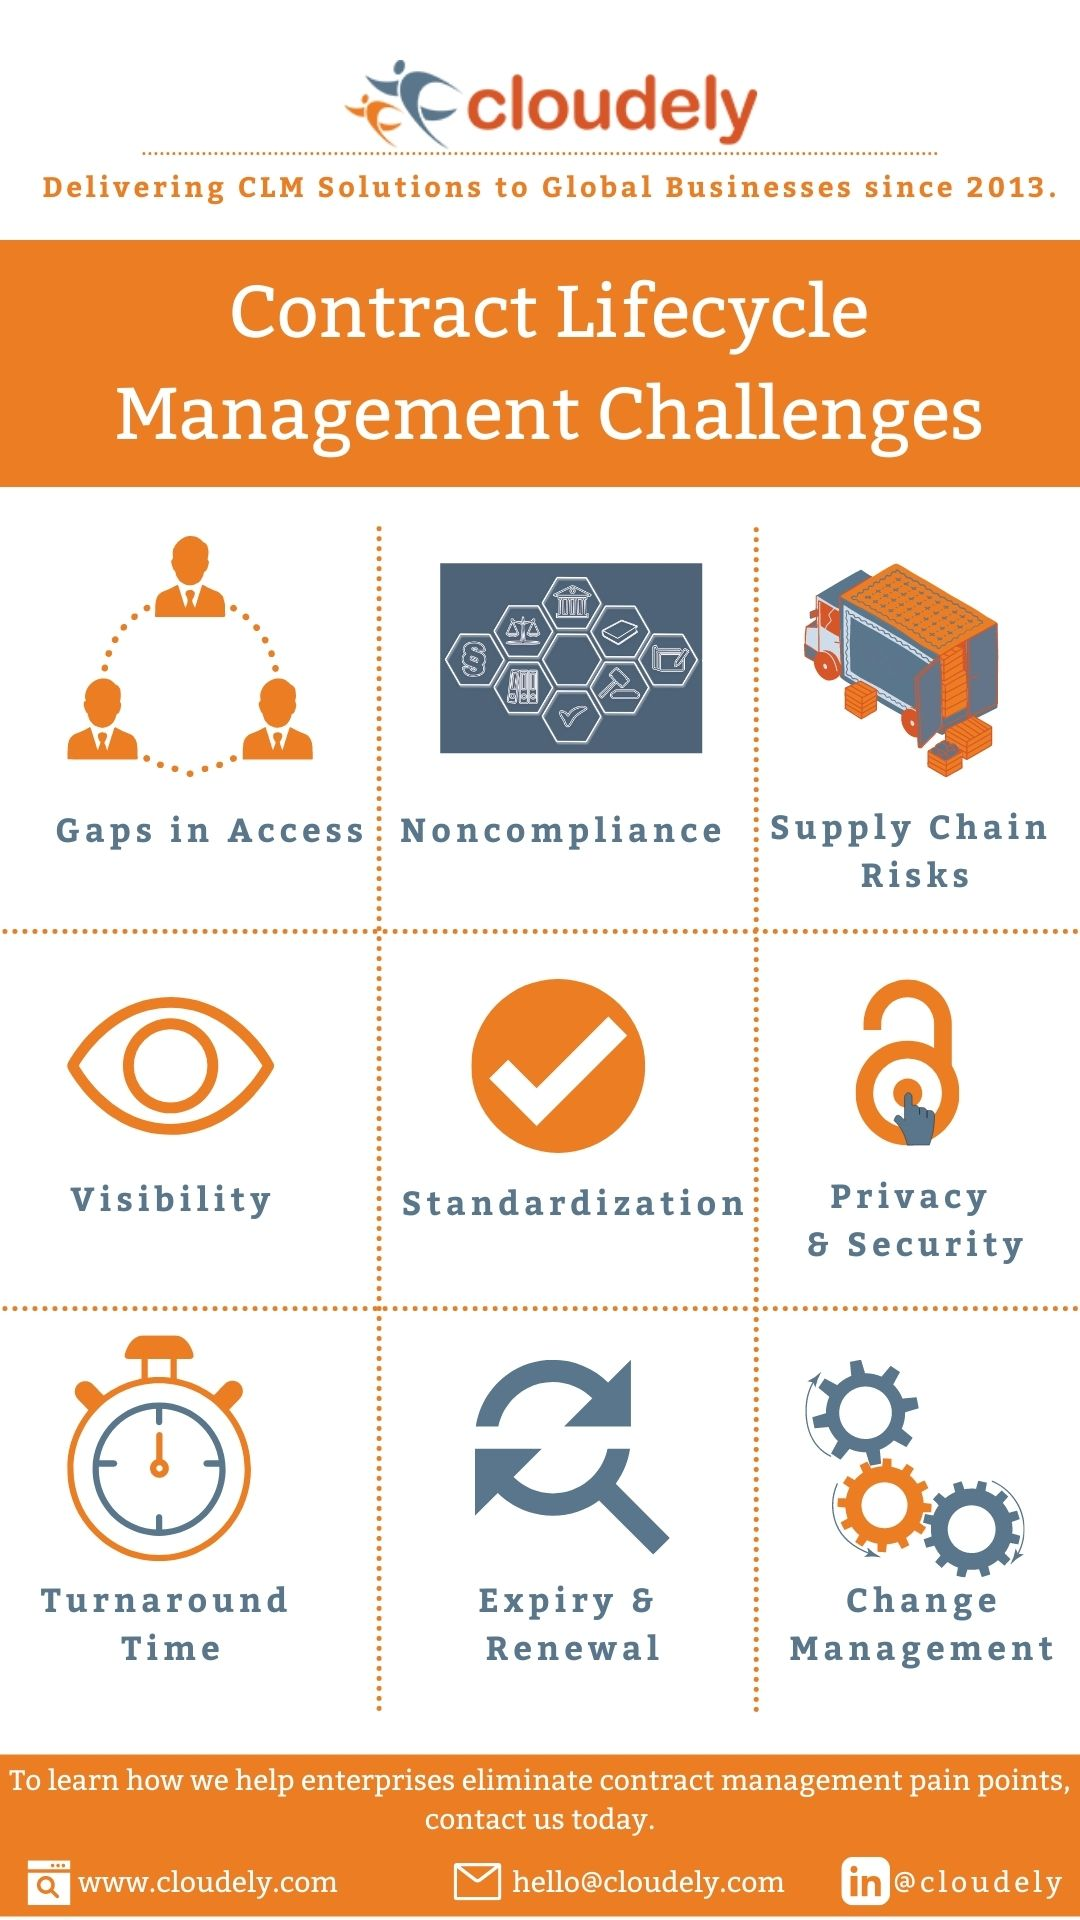 CLM Challenges